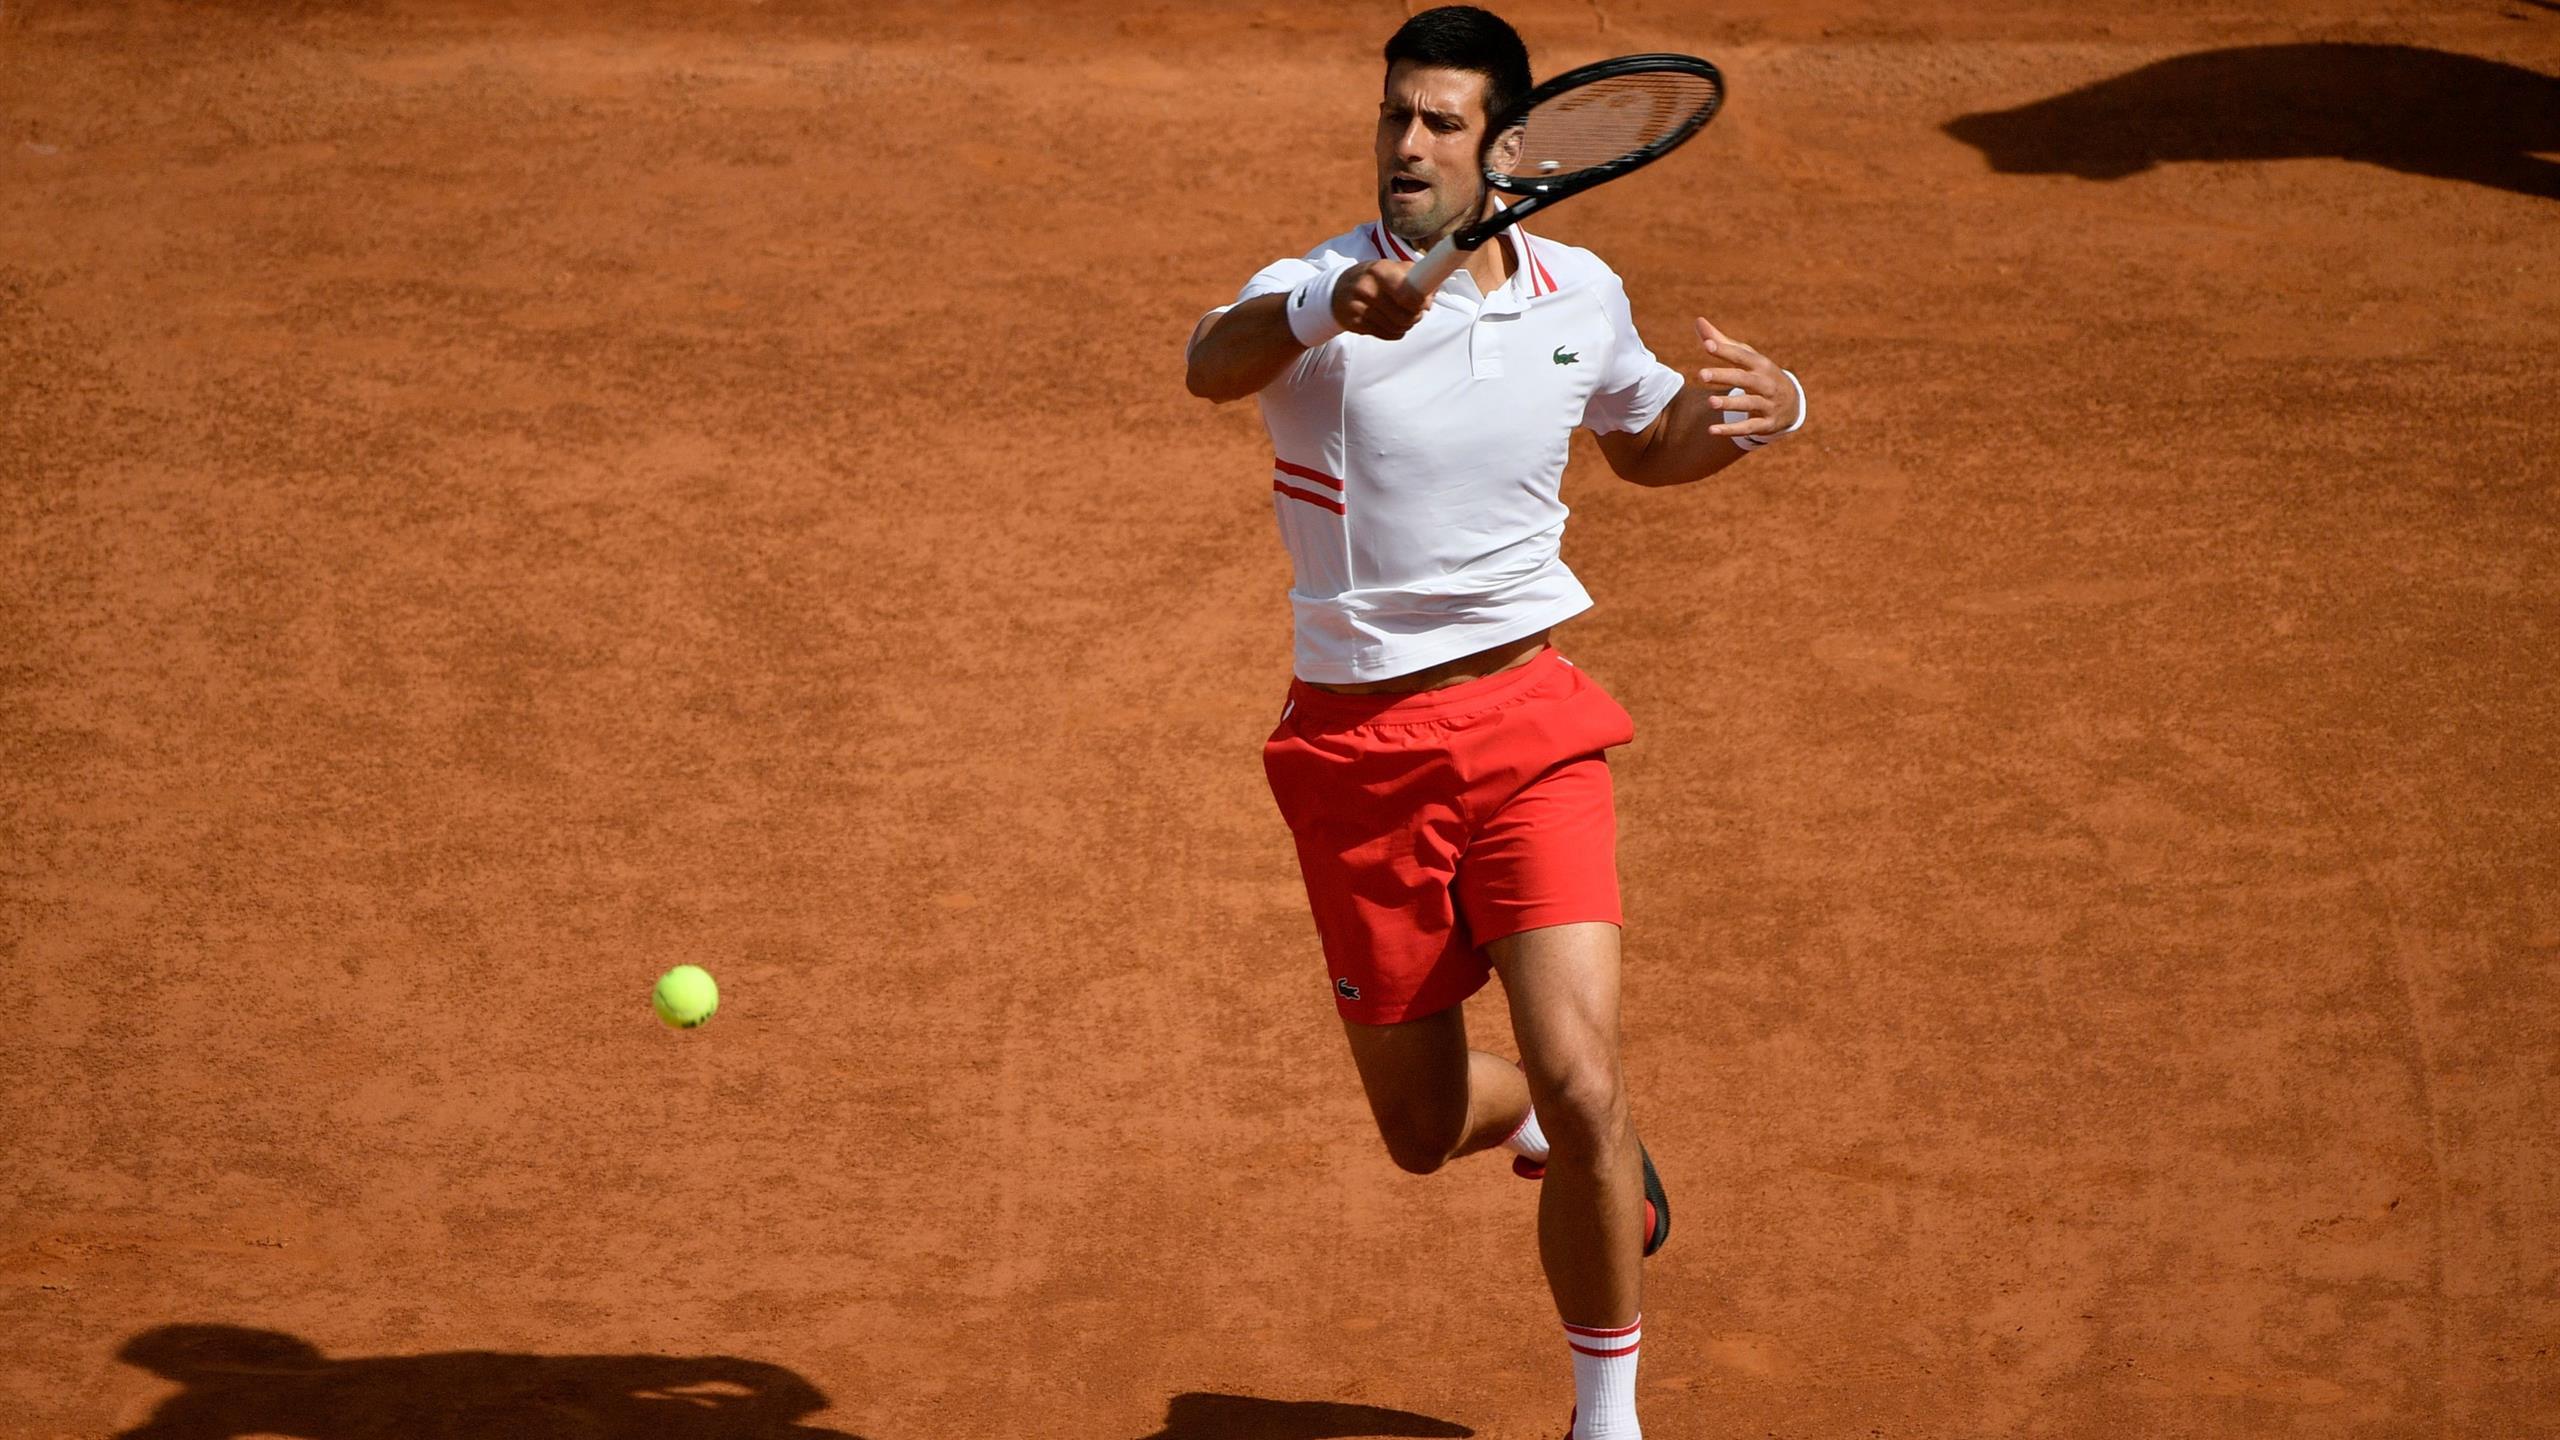 Masters 1000 Rome – Novak Djokovic vainqueur facile de Alejandro Davidovich Fokina